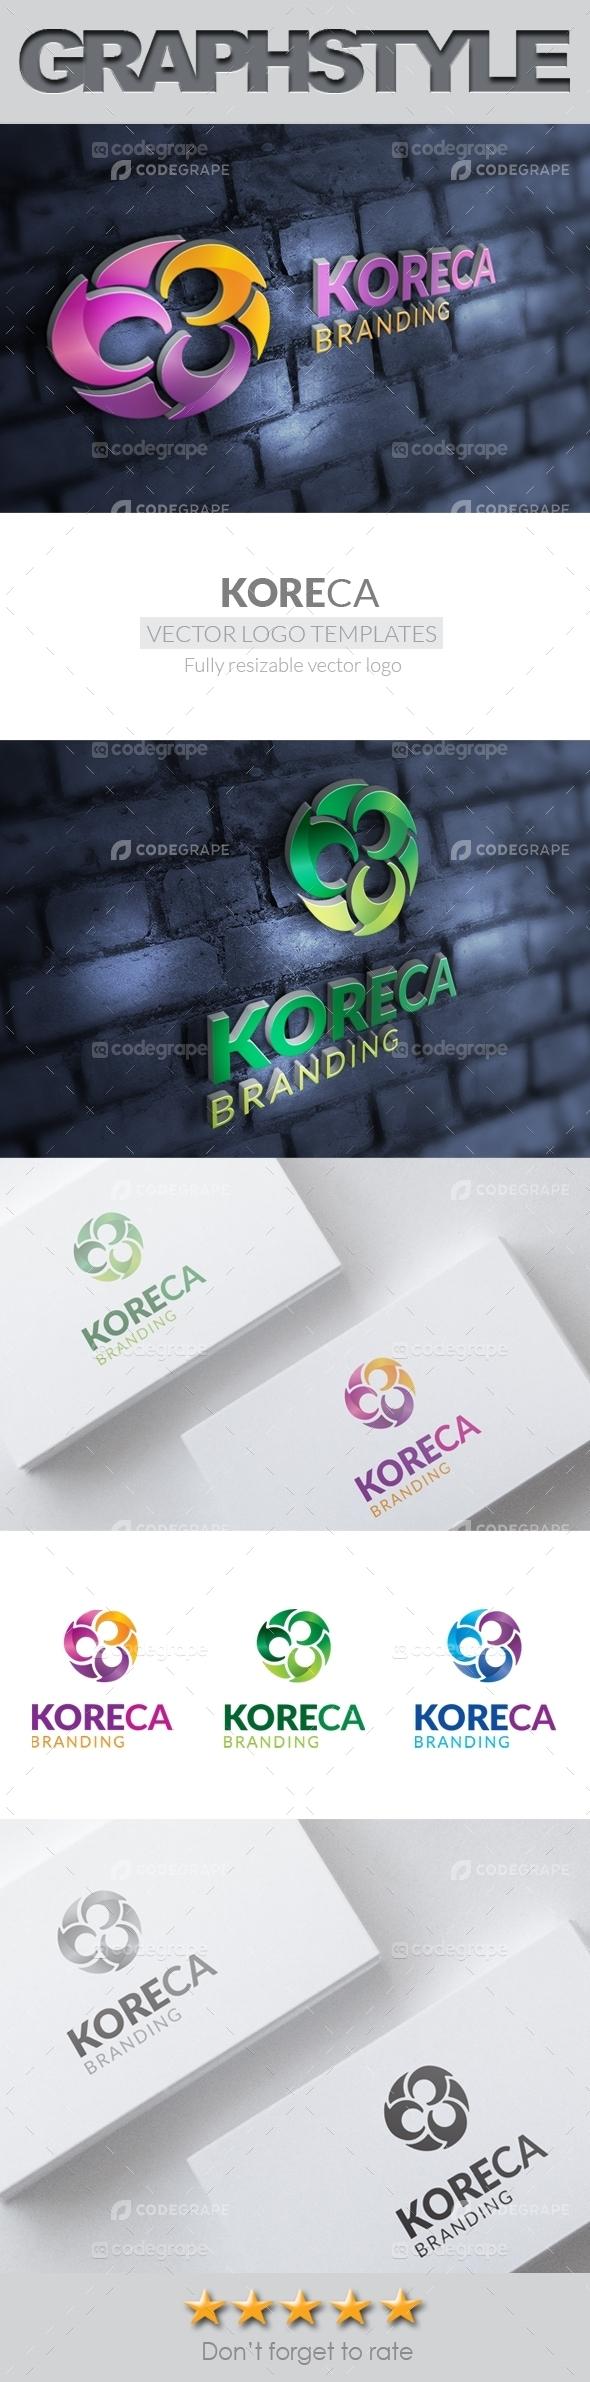 Koreca_Logo Templates